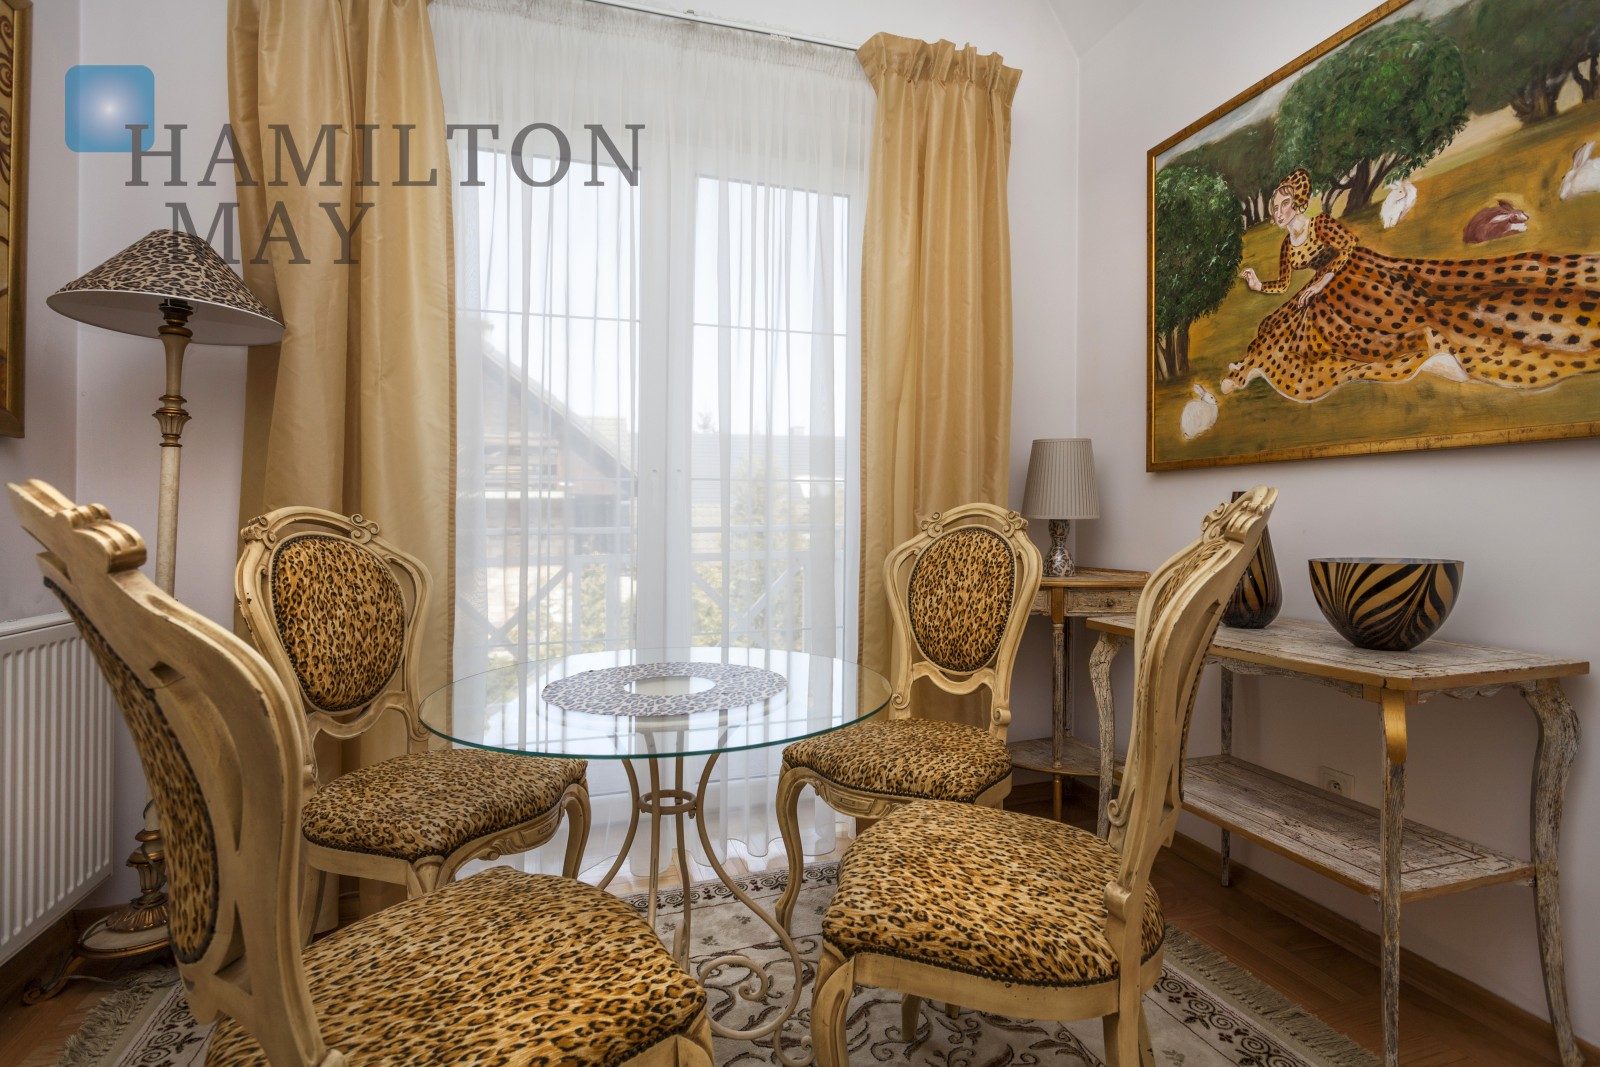 Luxurious and spacious house in Zabierzow, near Krakow Business Park Krakow for sale